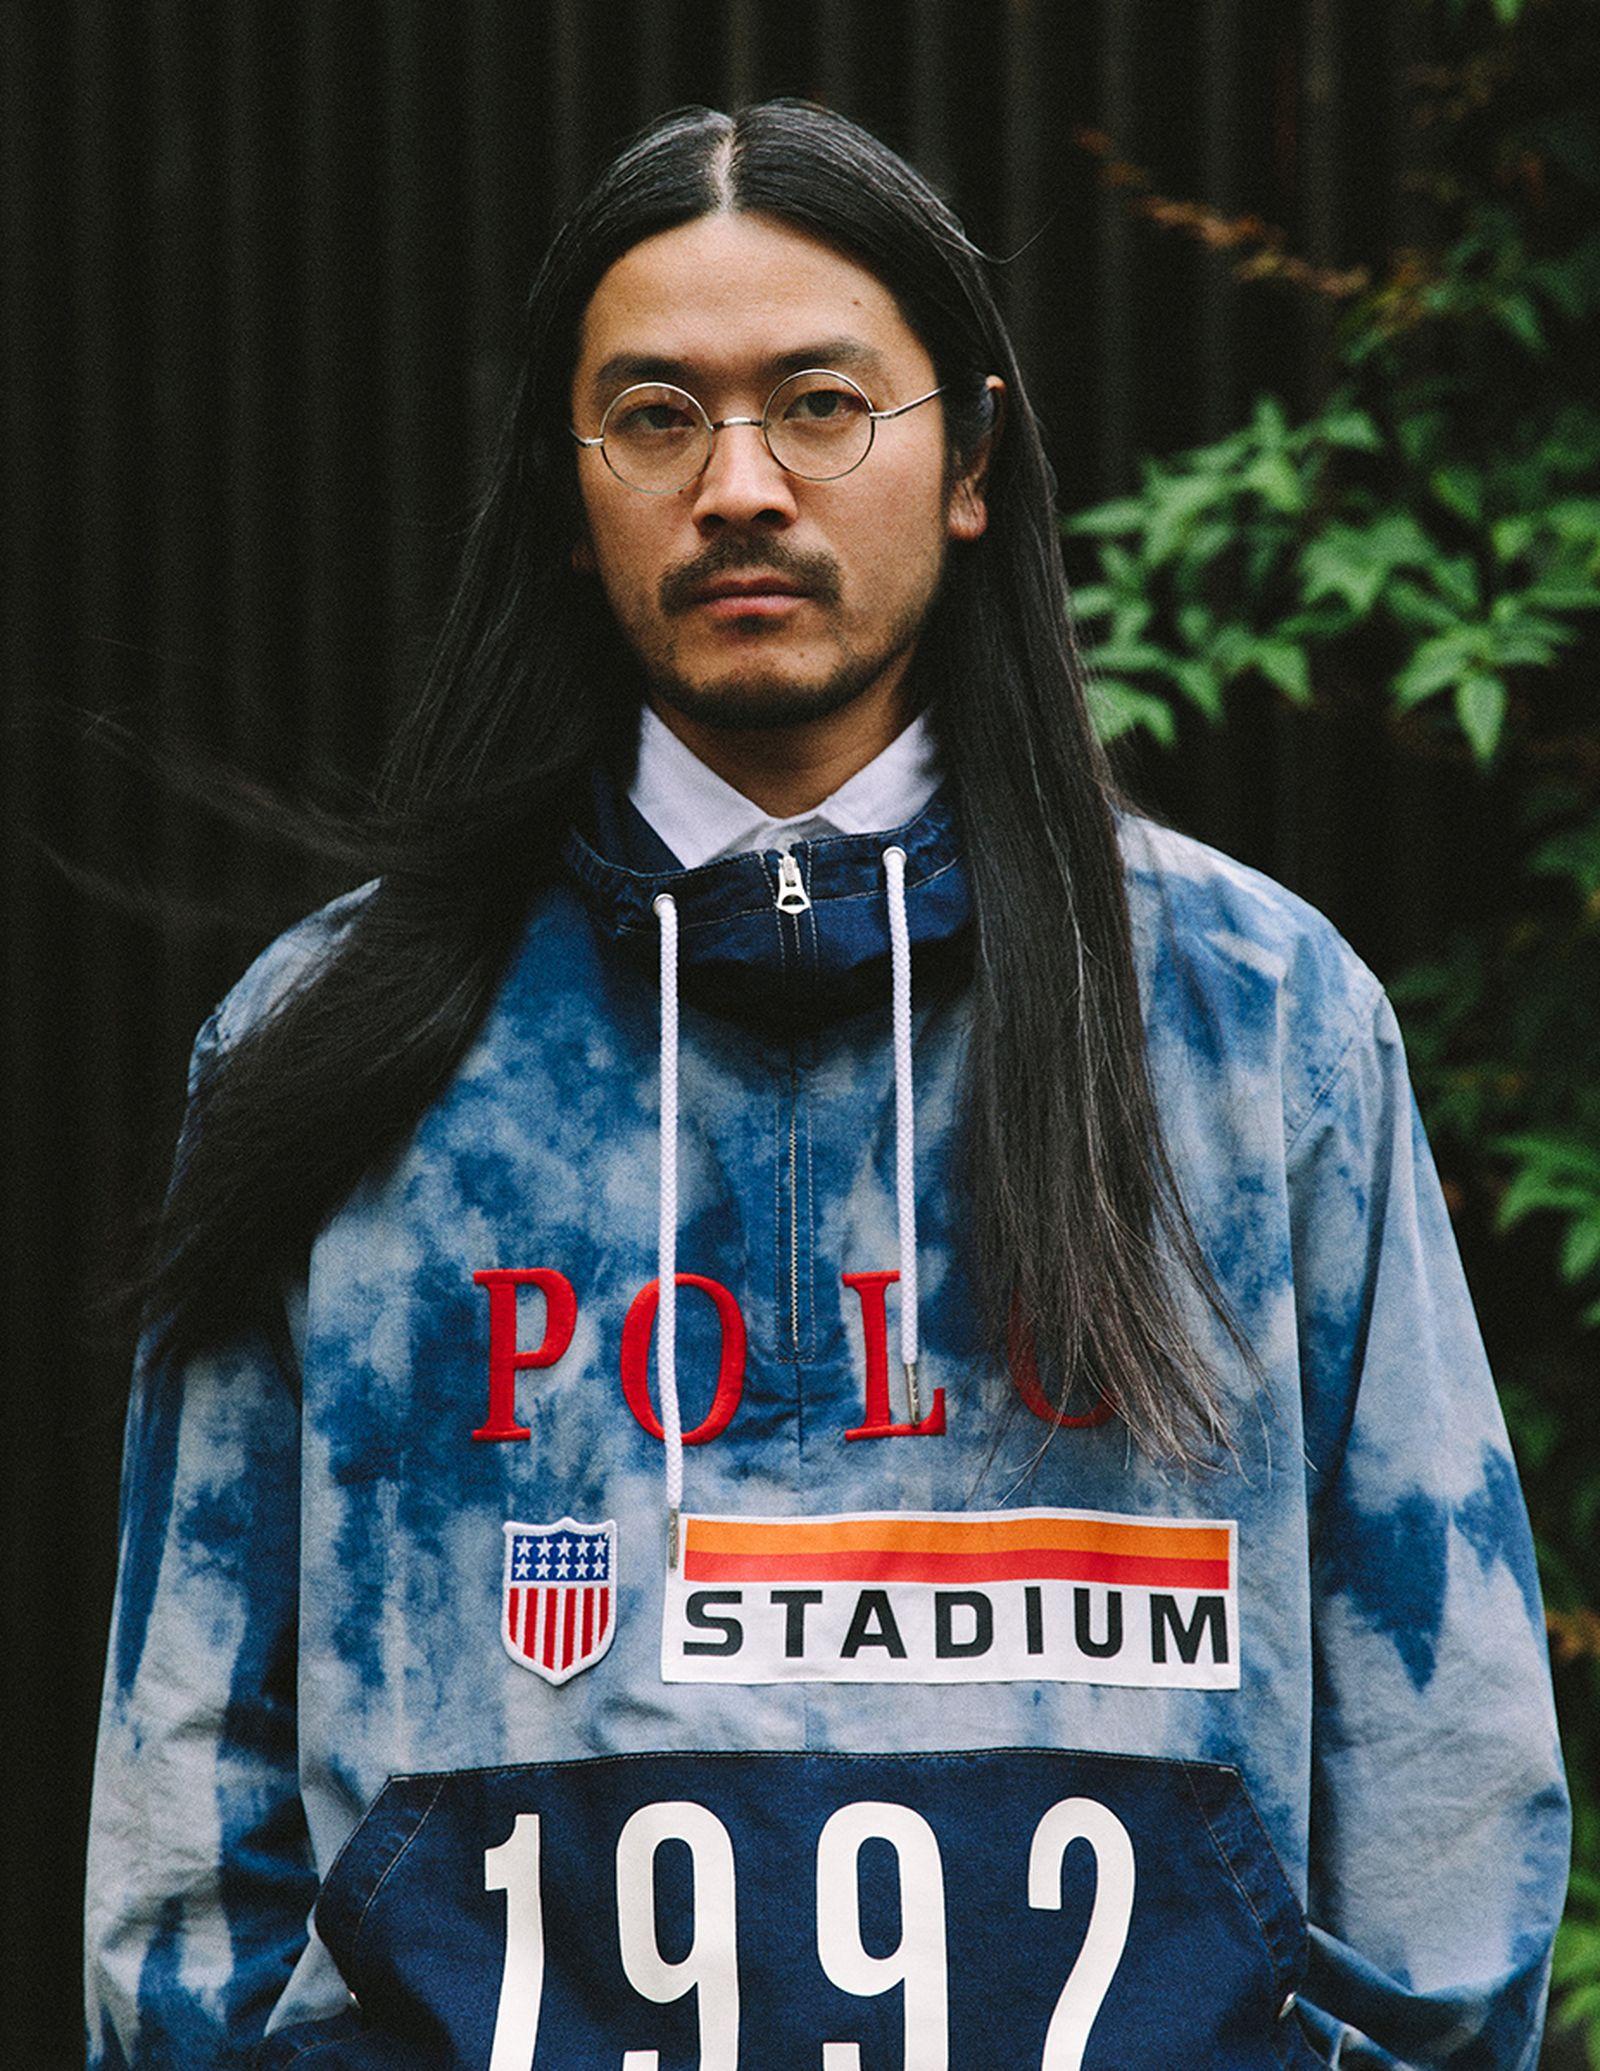 ralph lauren indigo stadium collection